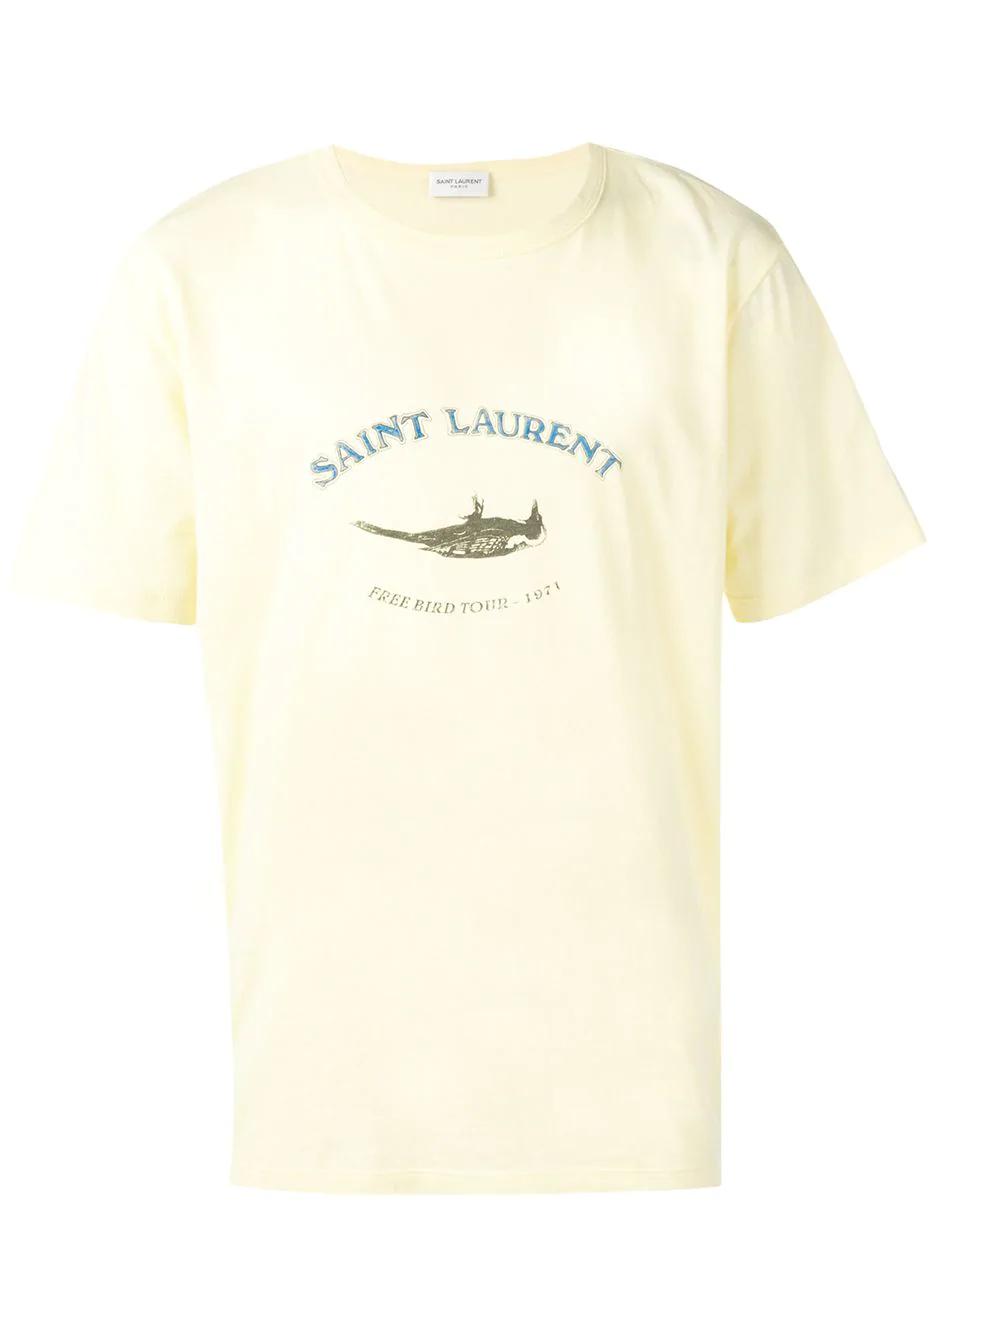 52745caa Saint Laurent Tour Logo Shirt - Yellow | ModeSens